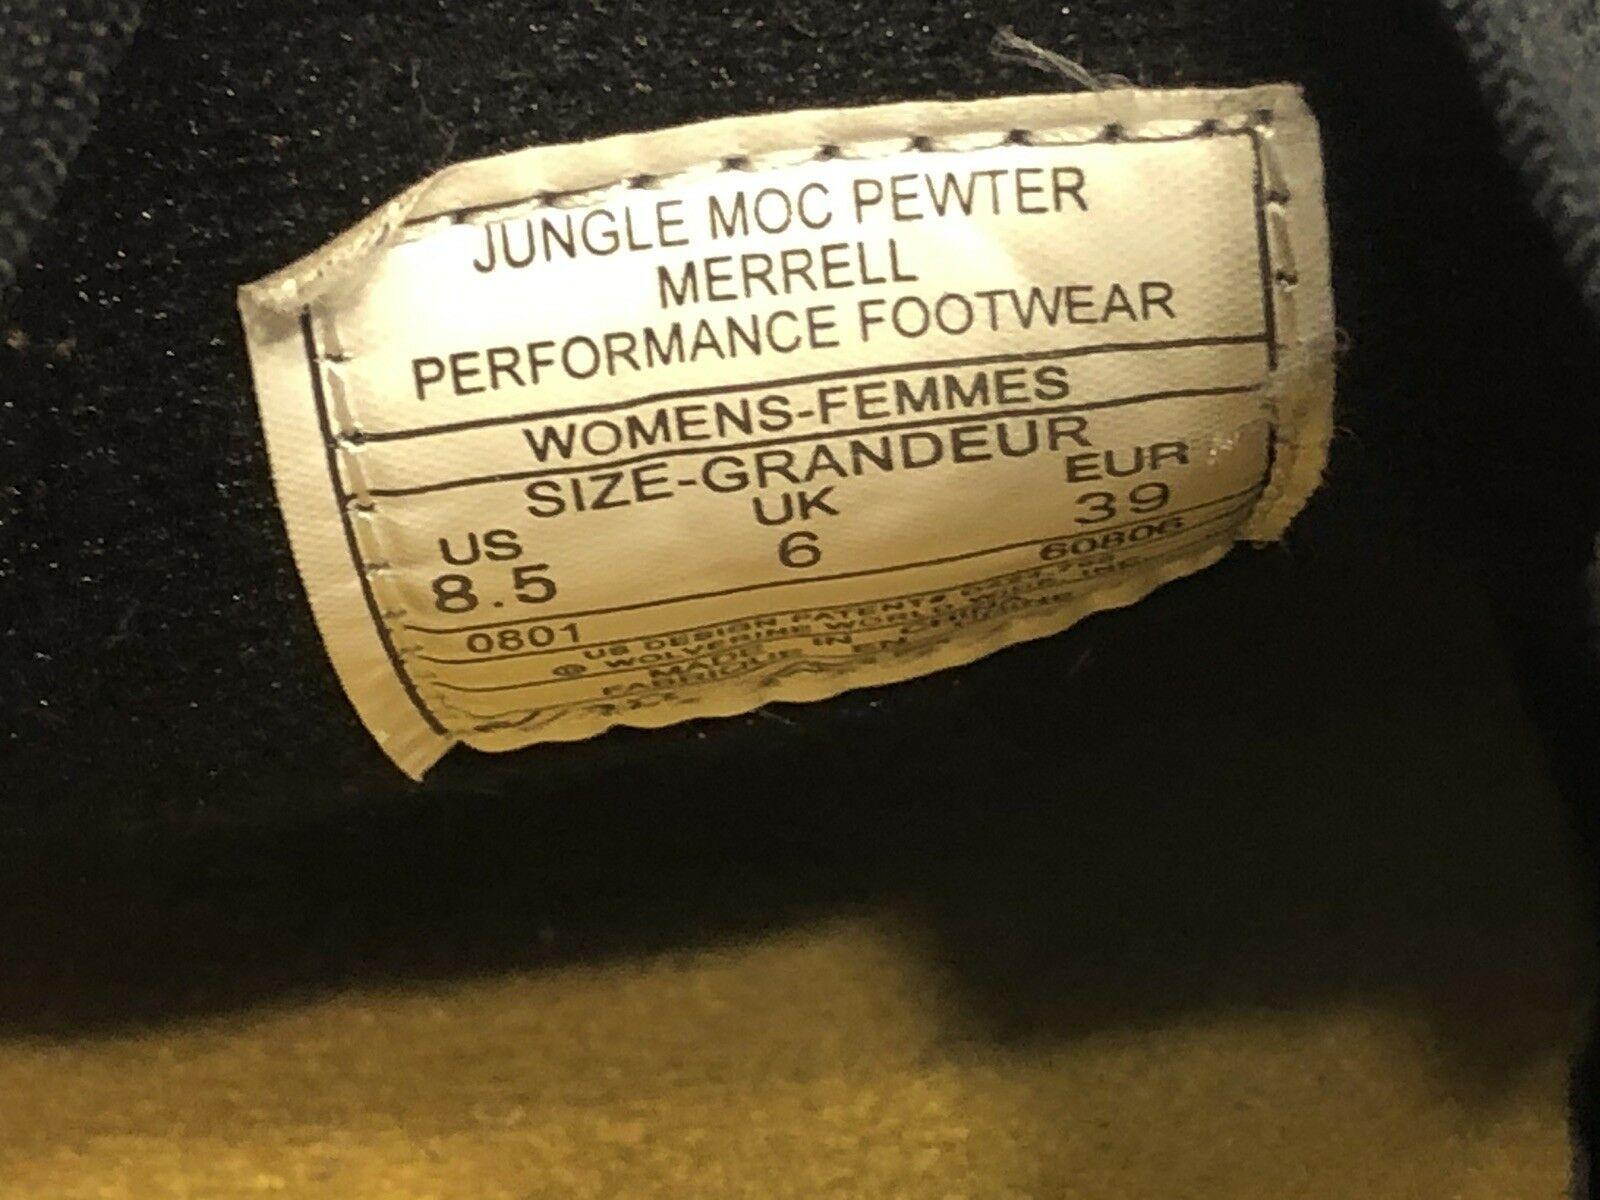 Merrell Jungle Moc Nubuck Slip On Women's Size 8.5 Pewter Gray